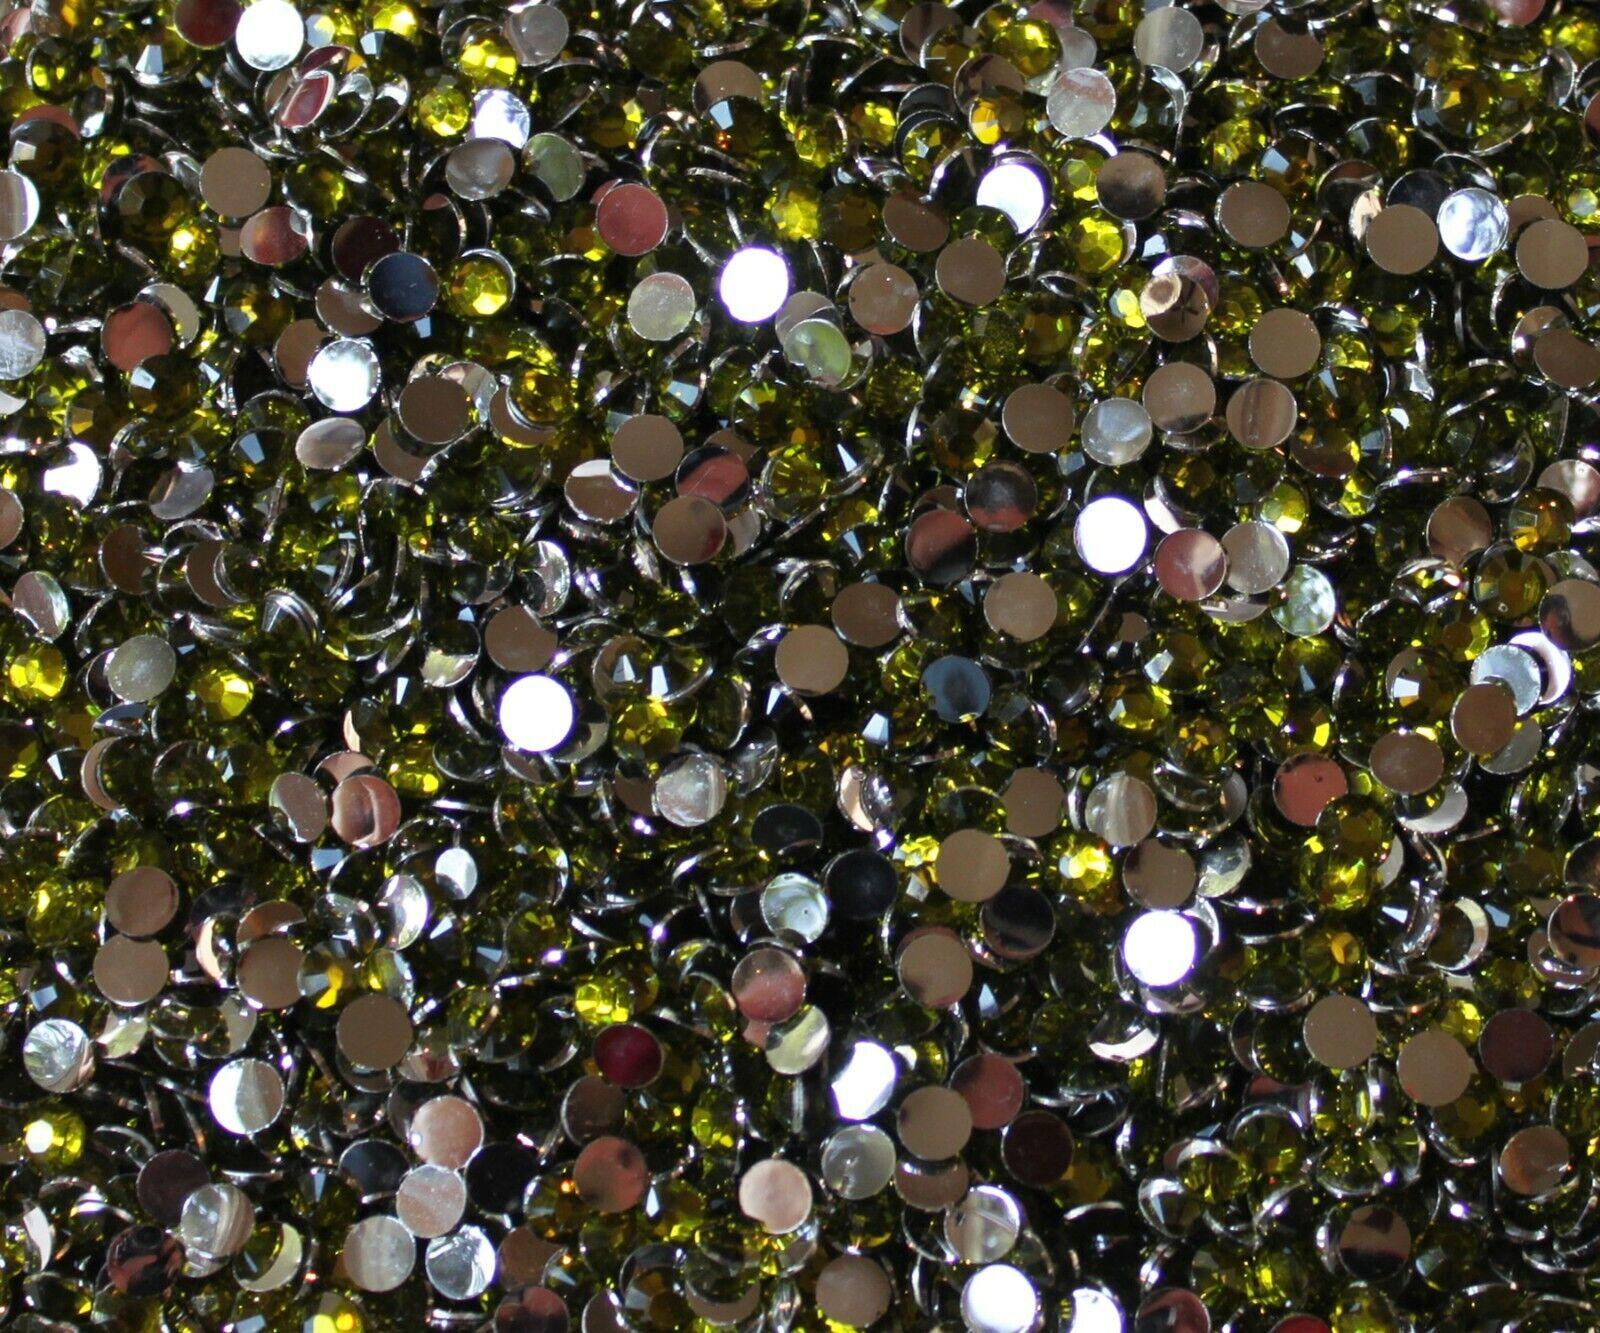 1000 Crystal Flat Back Resin Rhinestones Gems 60 colors, 2mm, 3mm, 4mm, 5mm, 6.5 OLIVINE